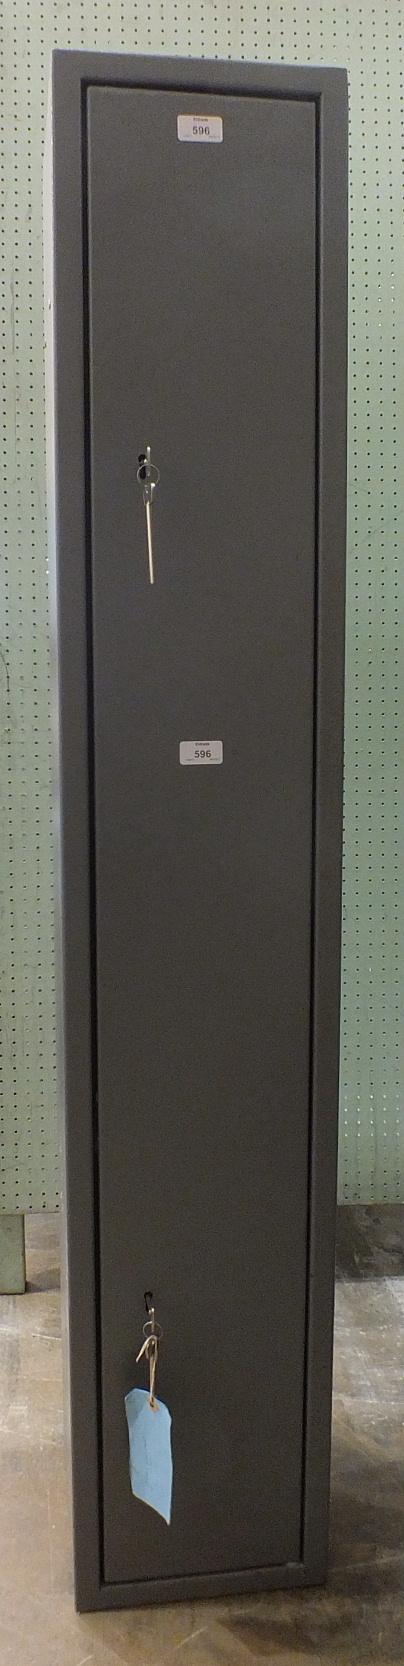 Lot 596 - A steel gun cabinet, 148cm high, 25cm wide, 27cm deep.